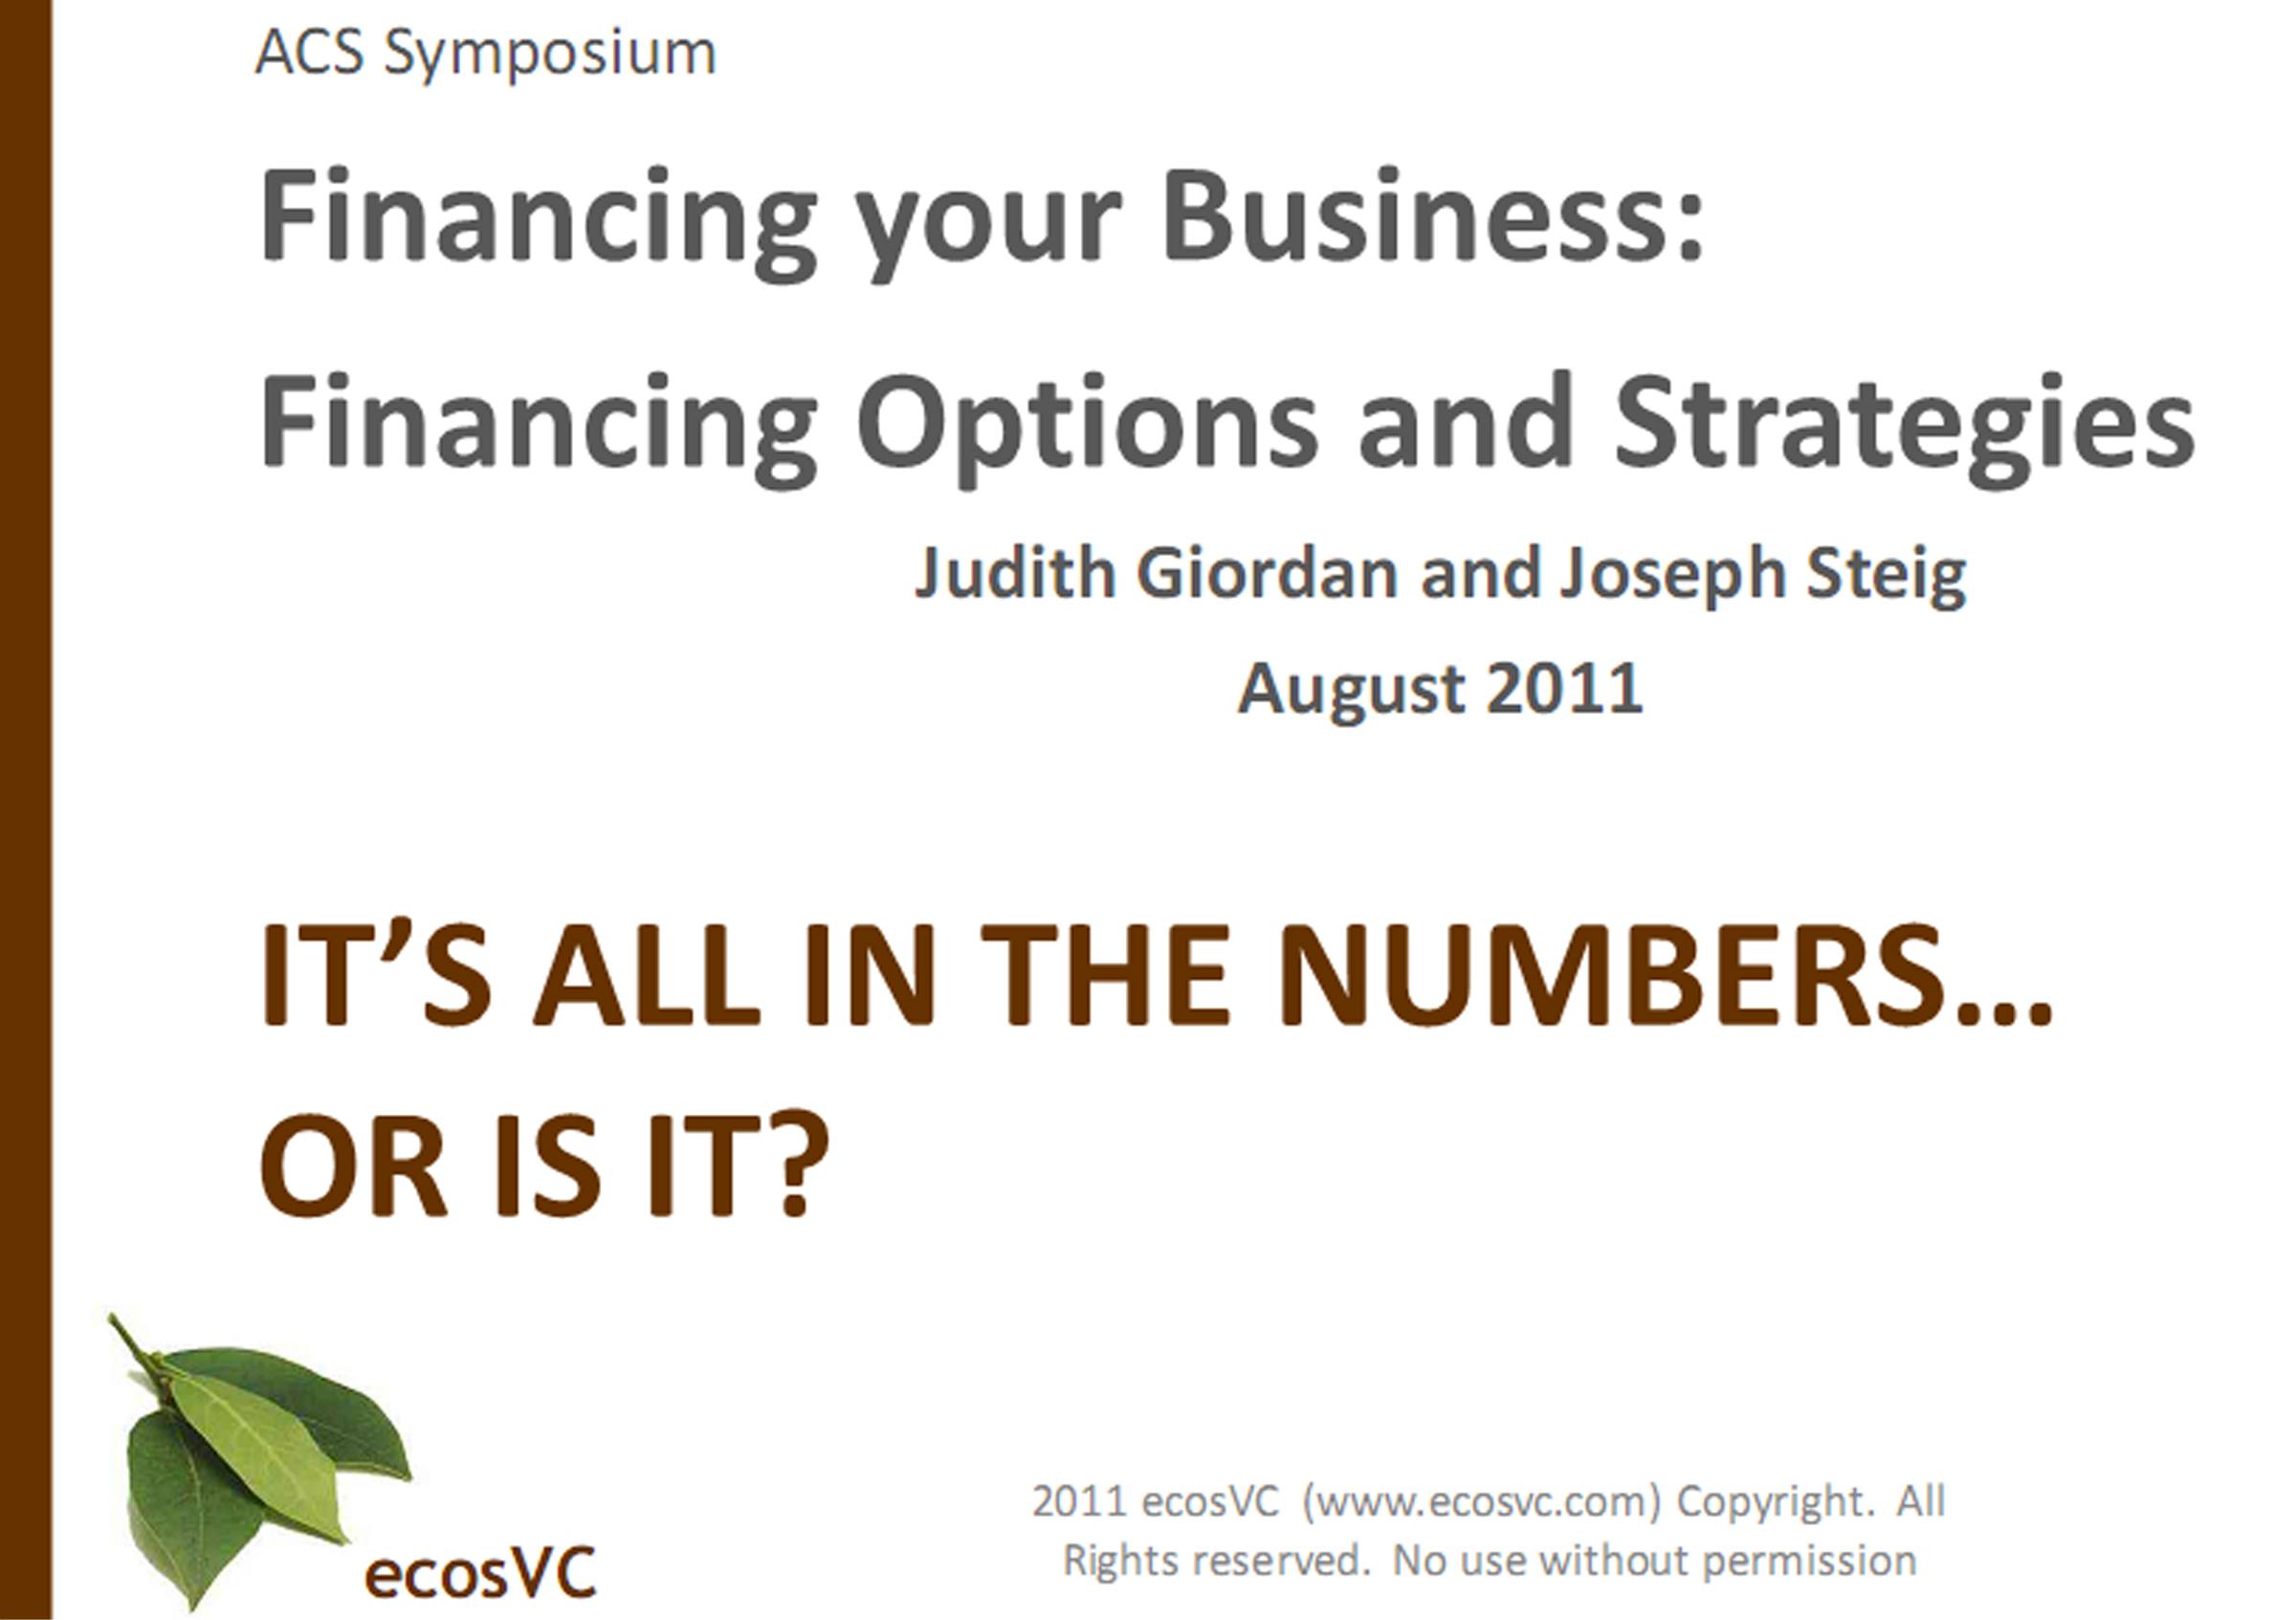 ACS_Finance_Giordan_Steig.jpg